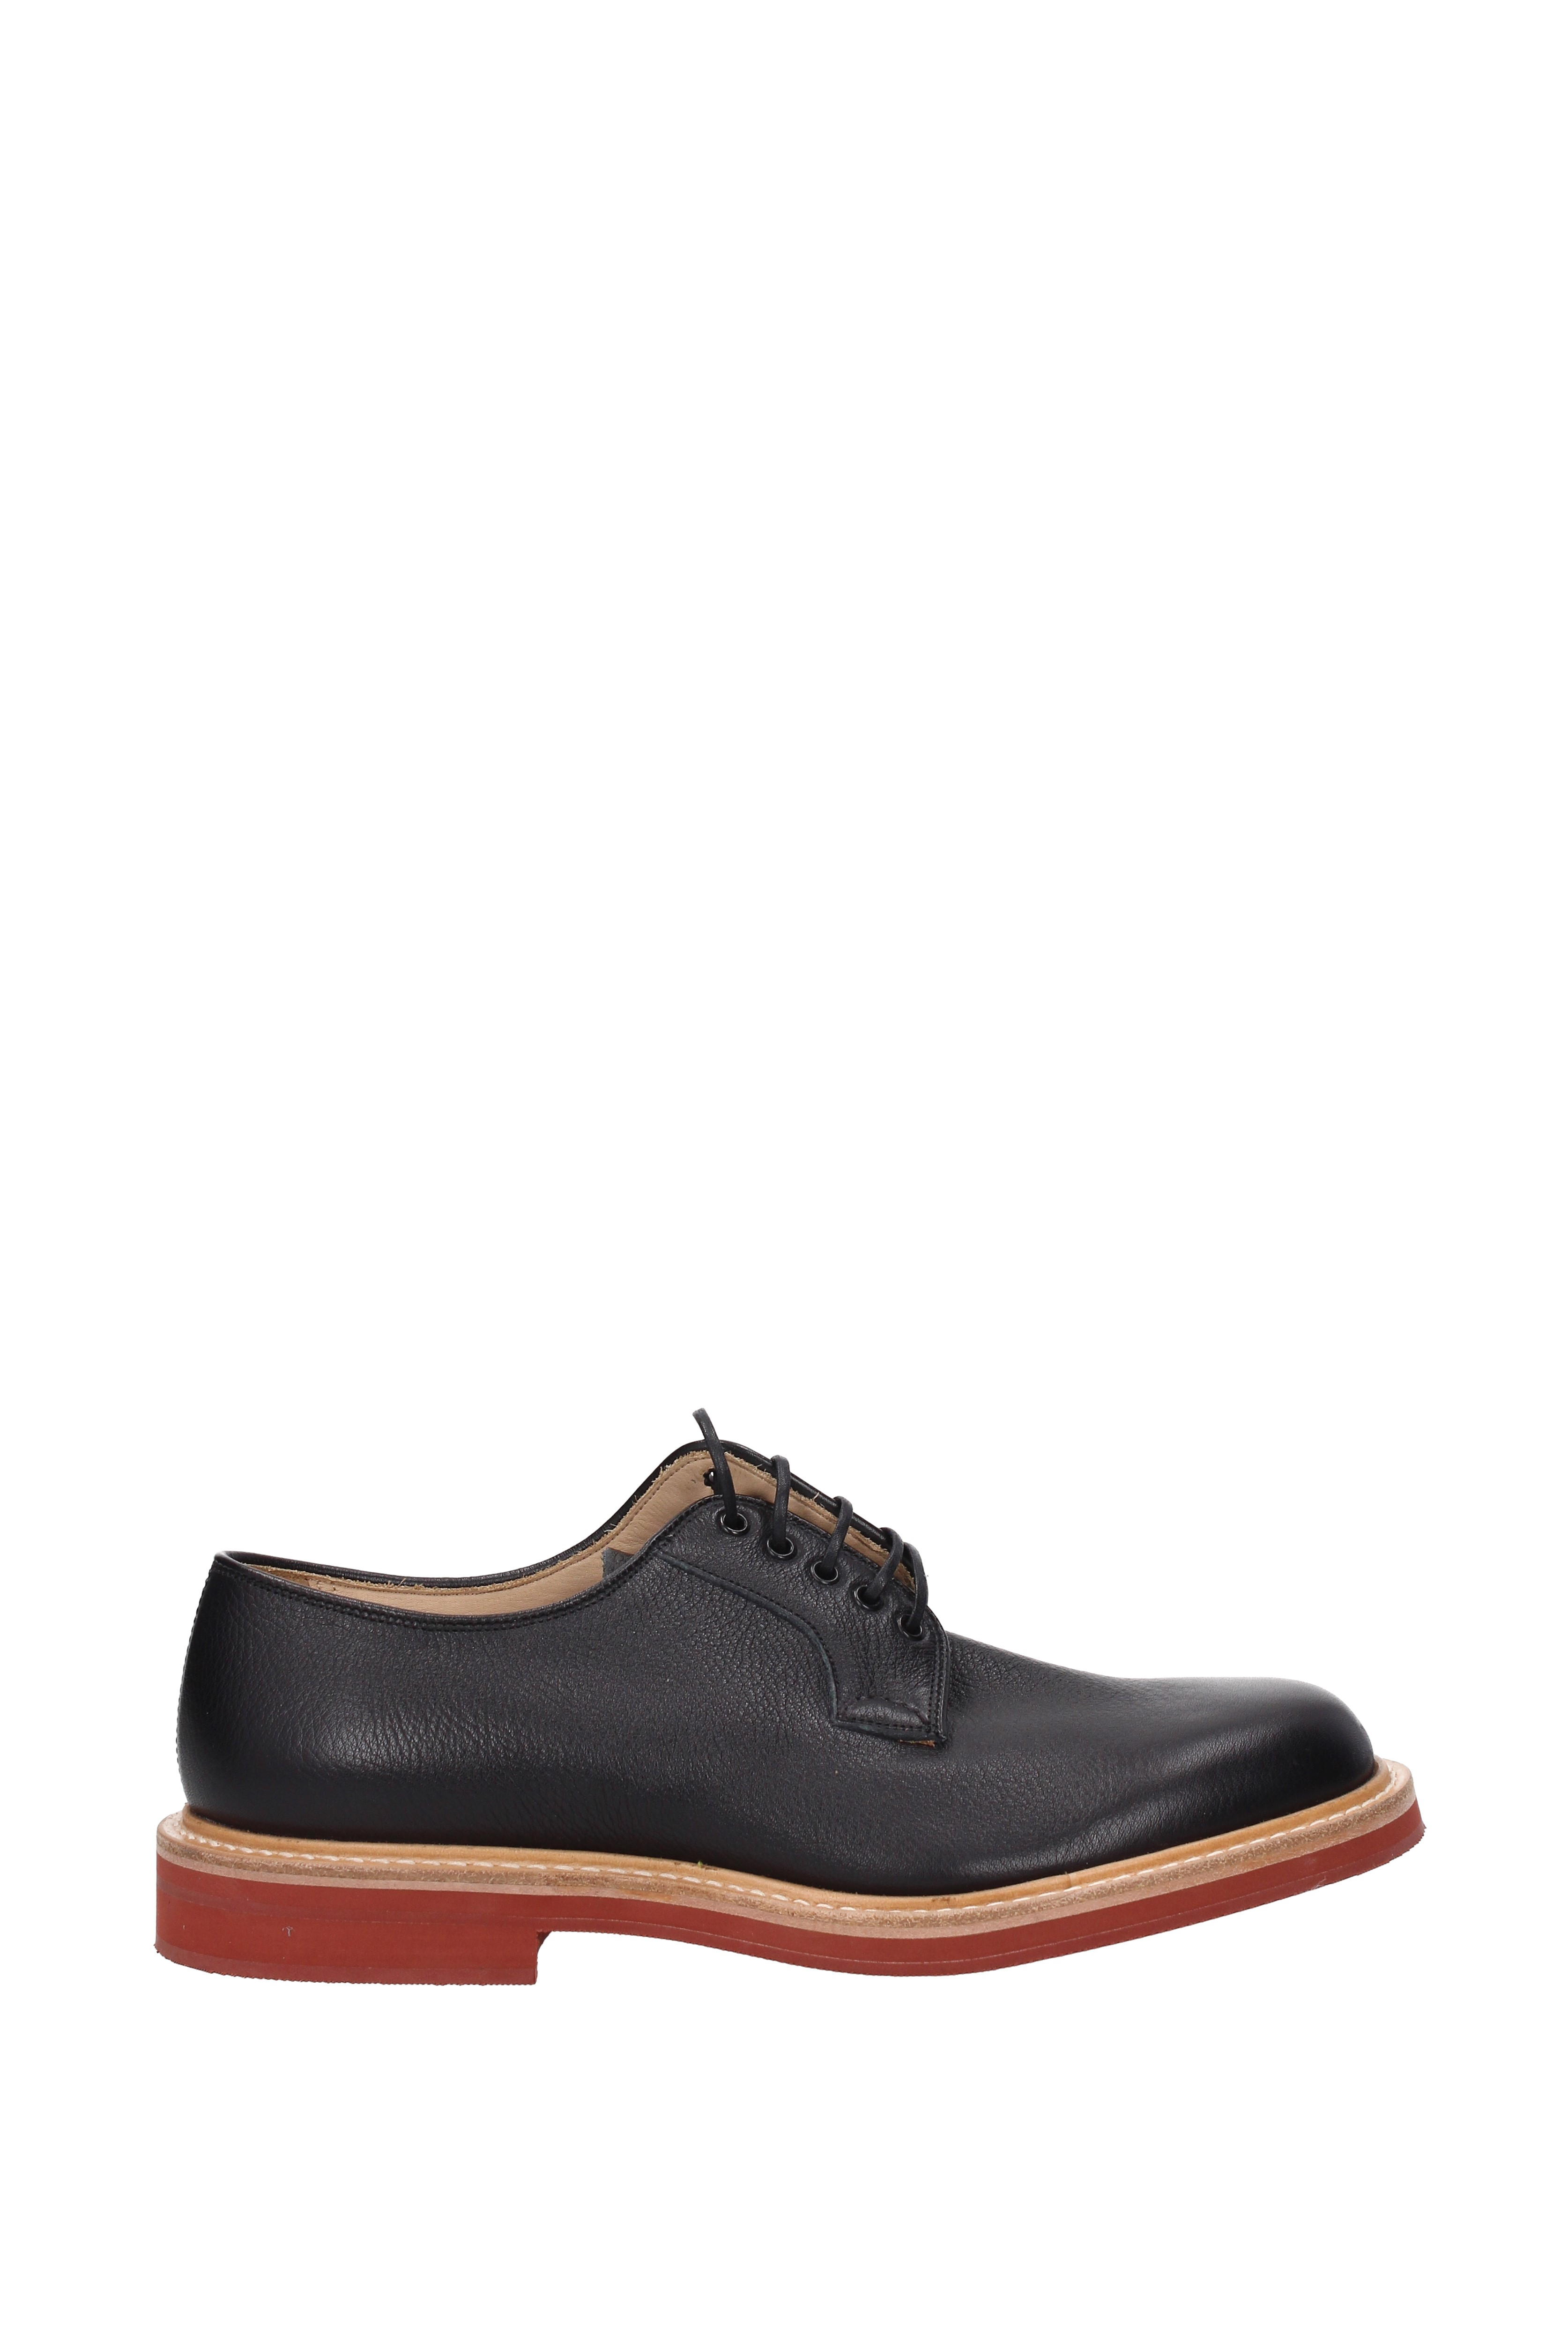 Scarpe casual da uomo  Laced shoes Church's fulbeck uomo - Leather (FULBECKDAINO)